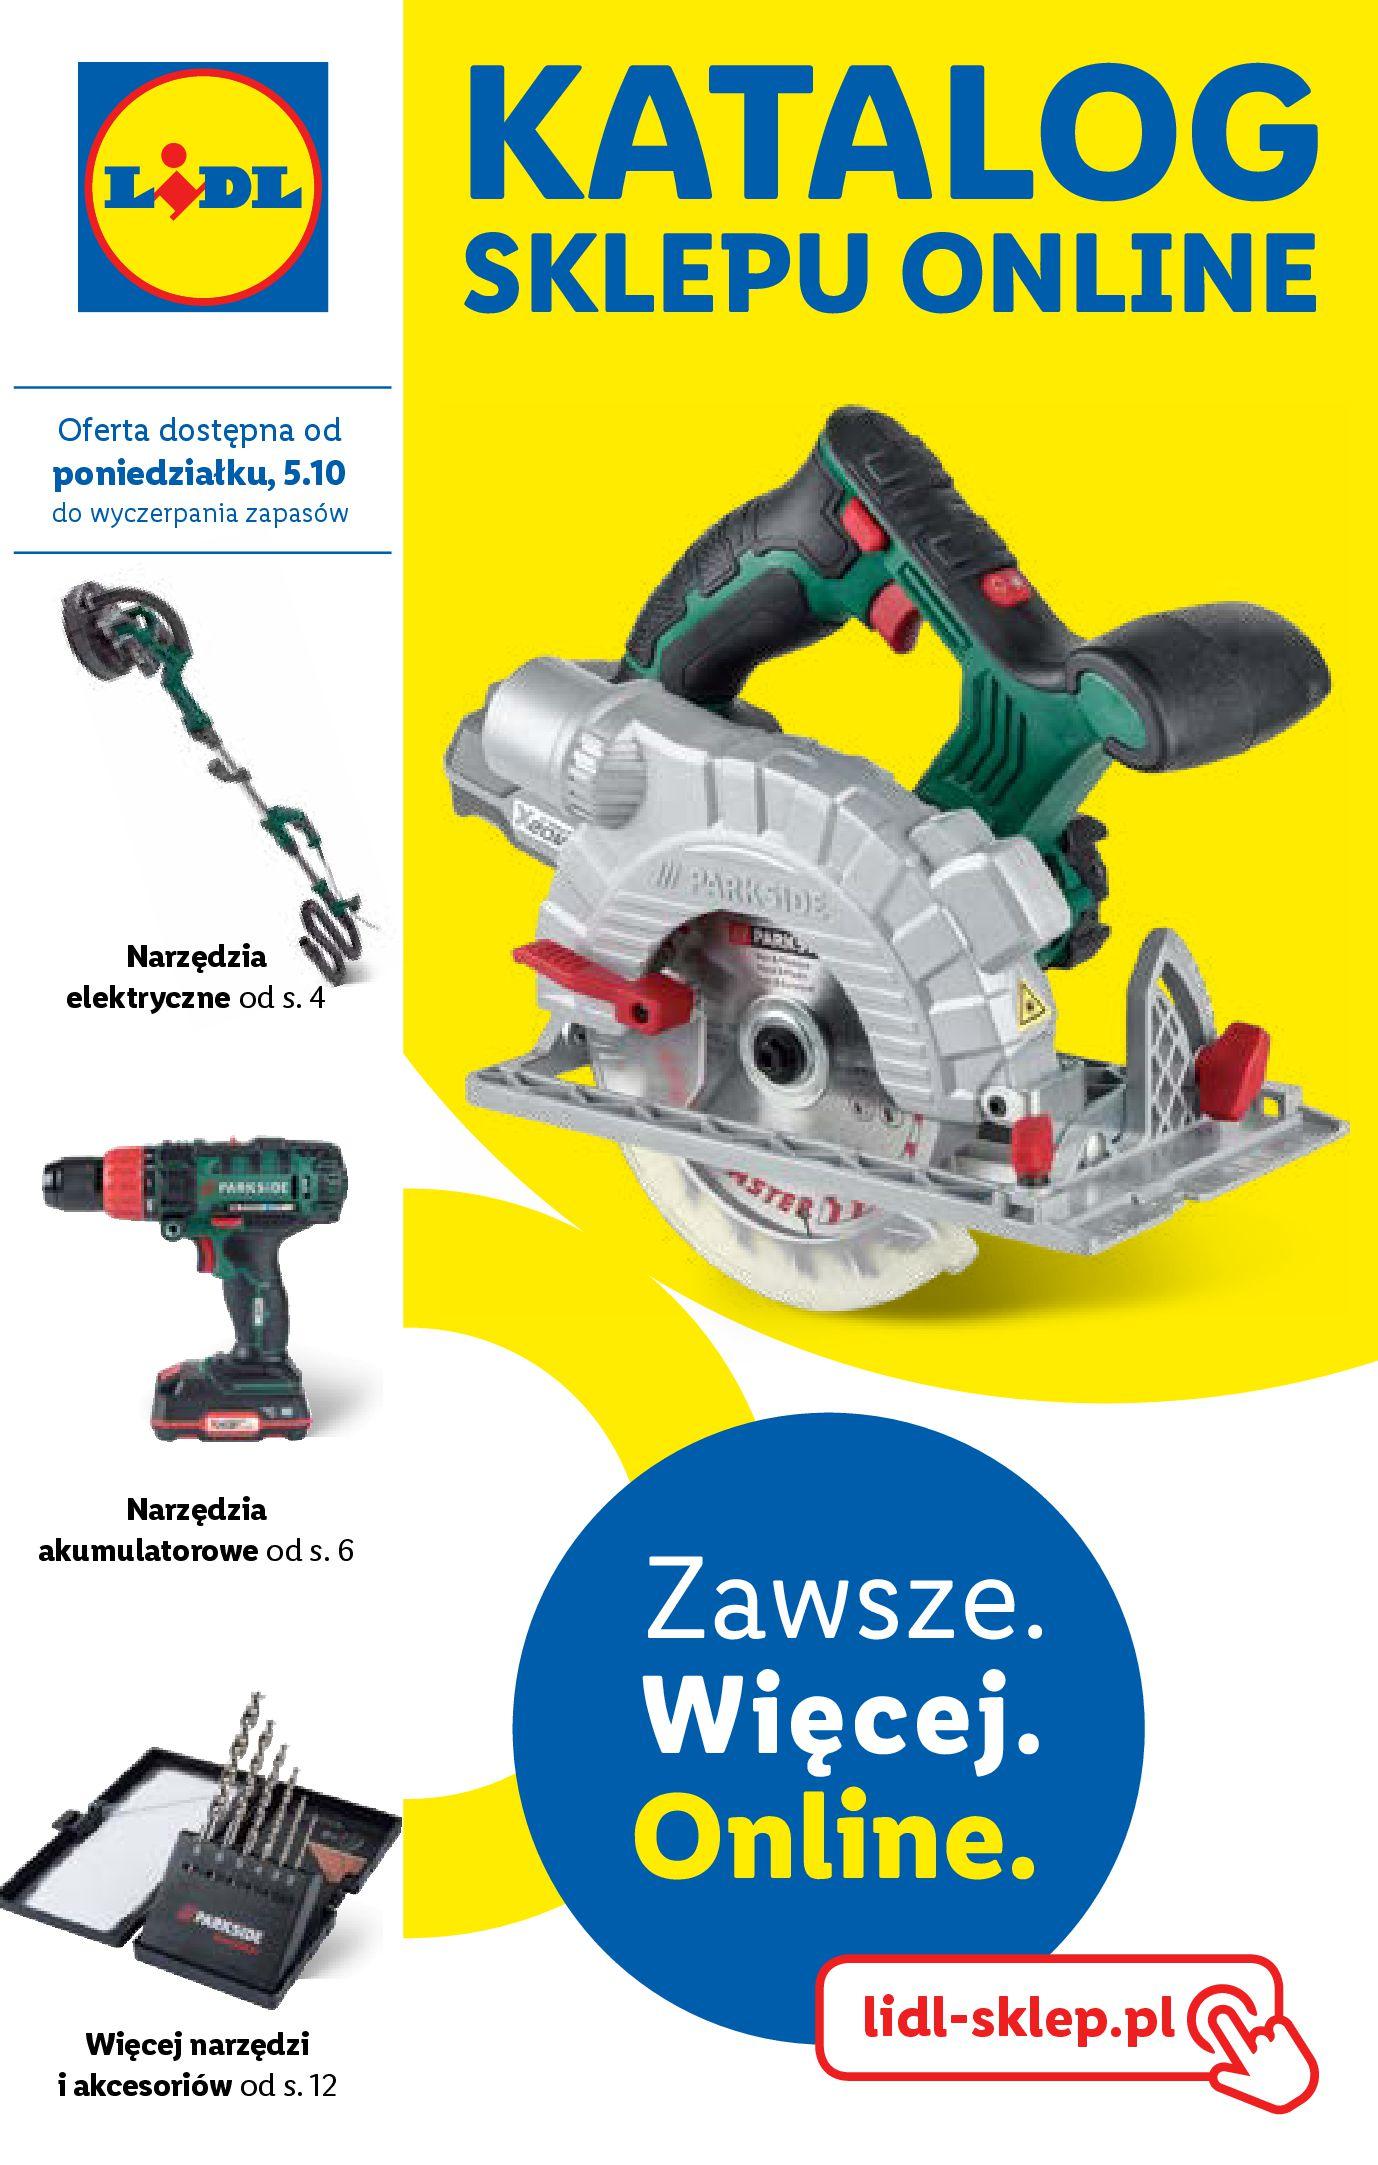 Gazetka Lidl - Katalog sklepu ONLINE-04.10.2020-31.10.2020-page-1